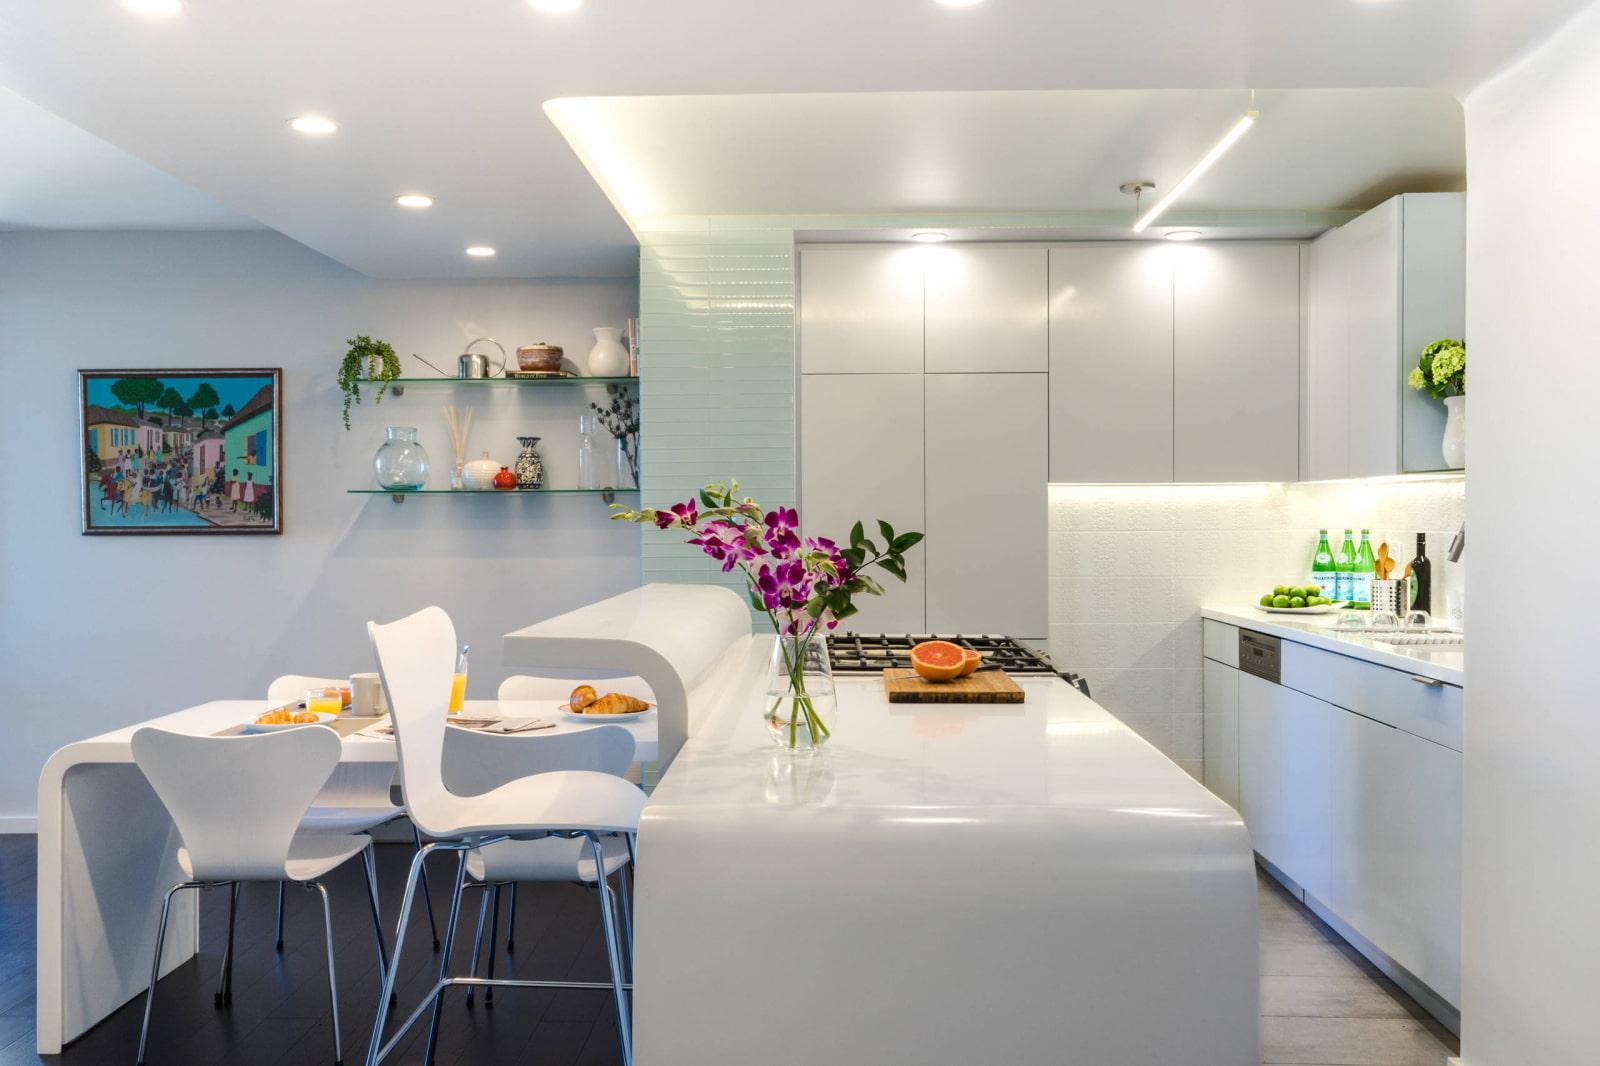 кухонный гарнитур с подсветкой